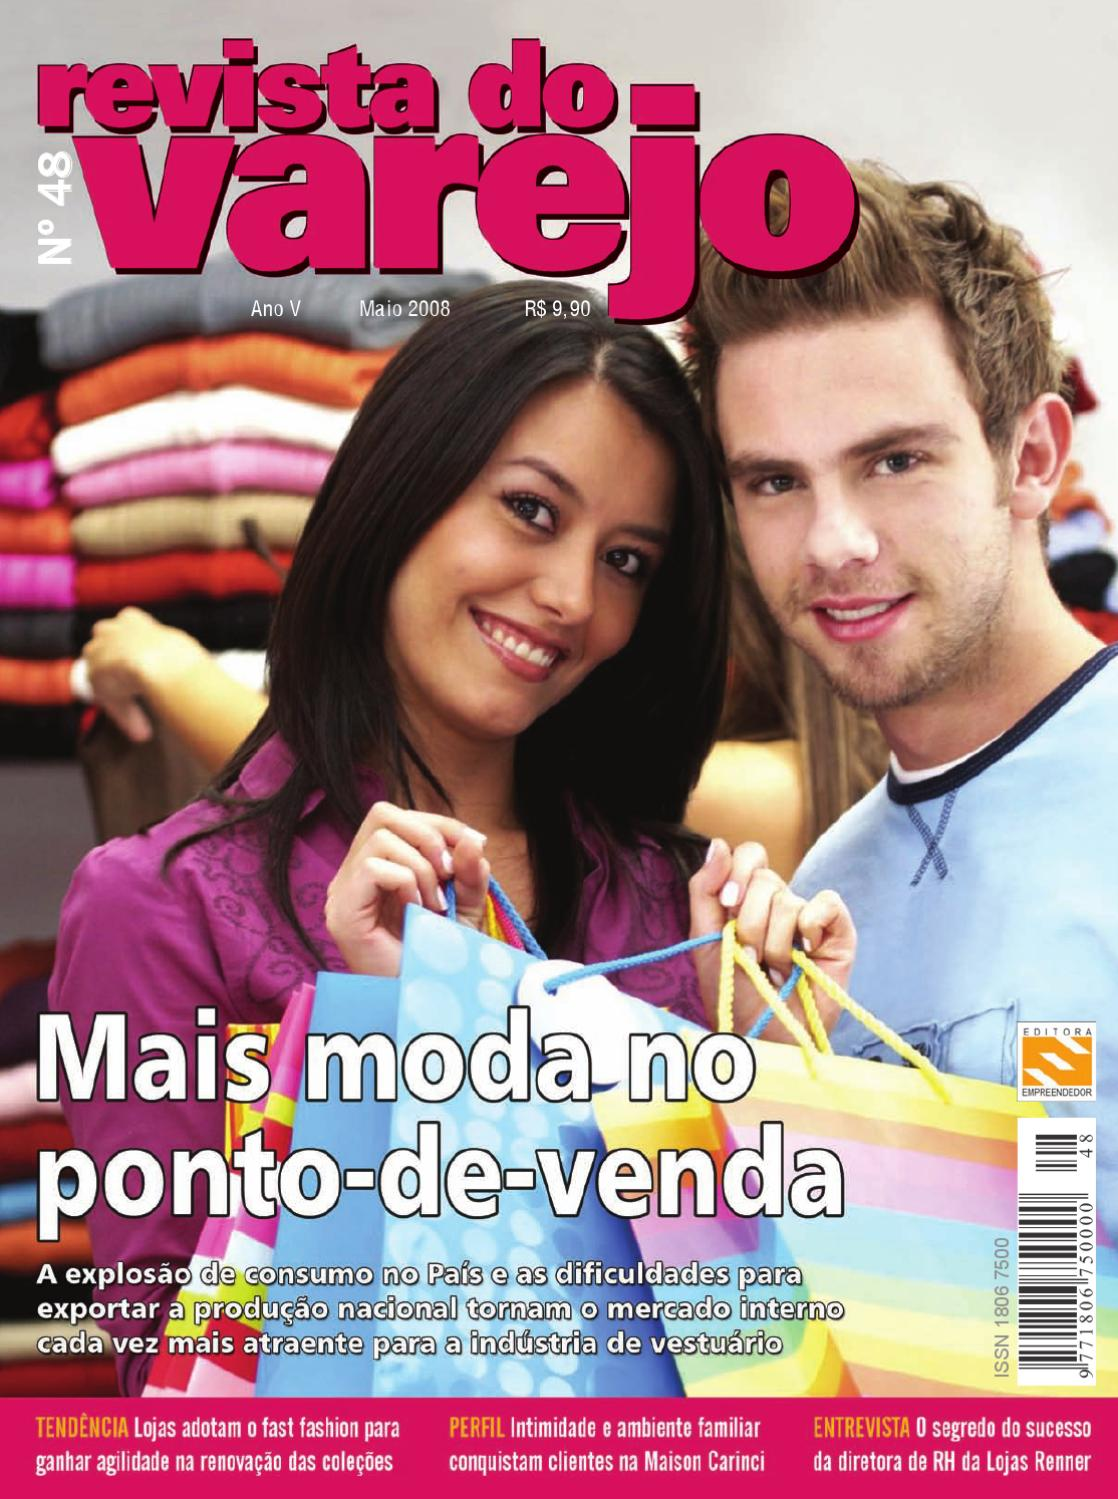 b9c6ec534d2 Revista do Varejo 48 by Revista Empreendedor Varejo - issuu